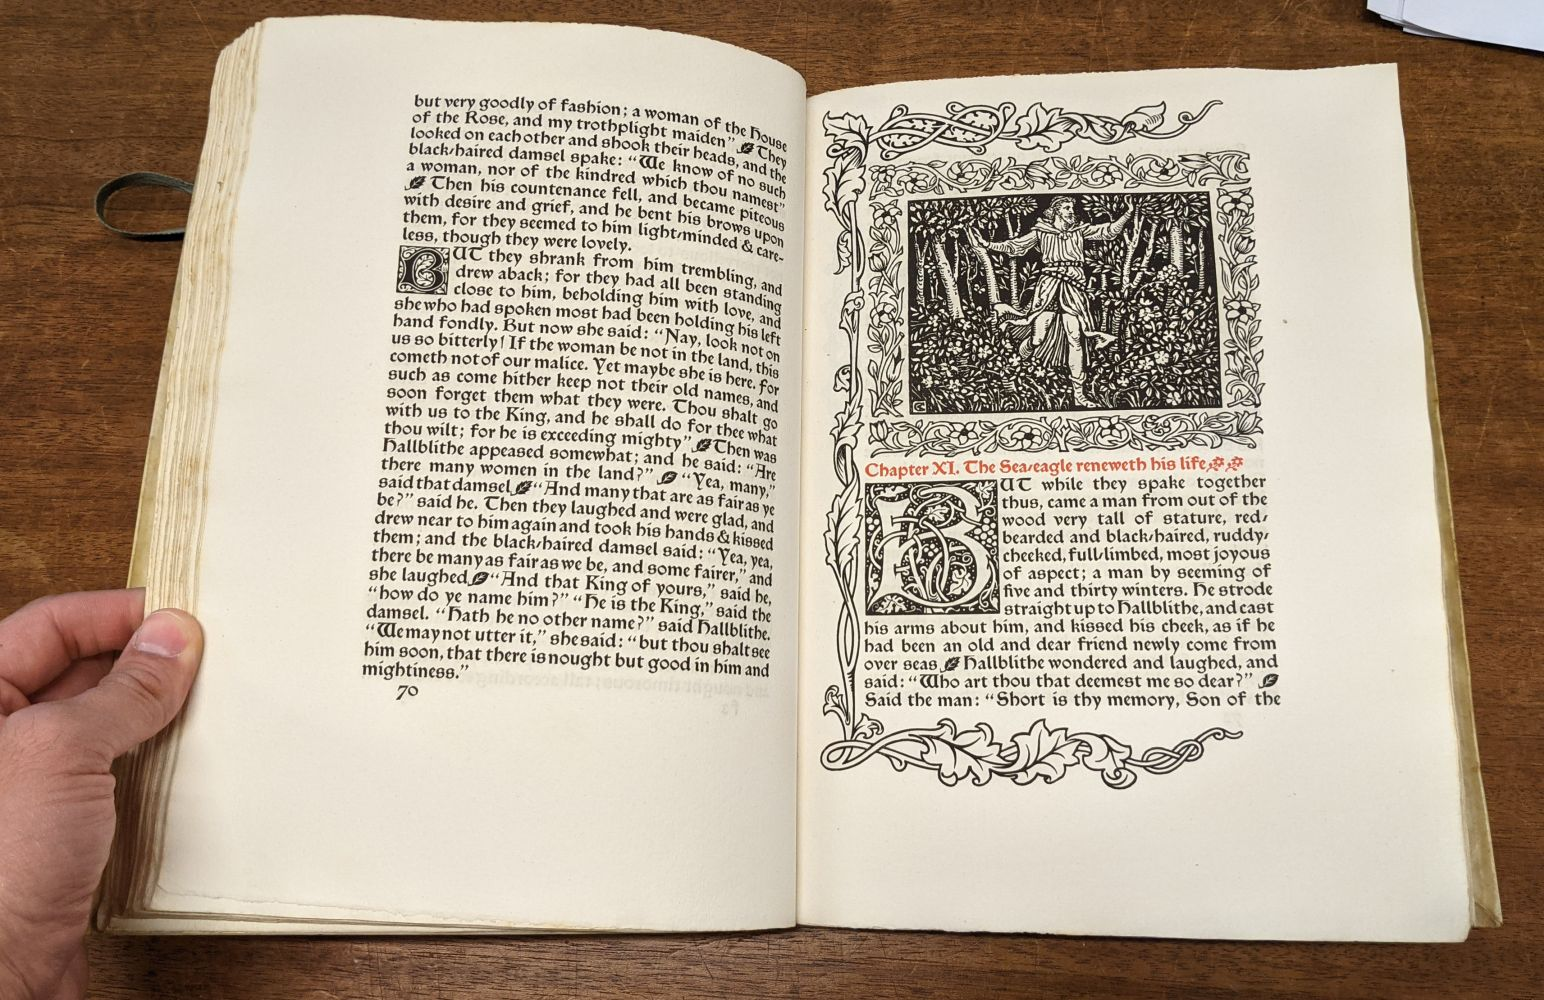 Kelmscott Press. The Story of the Glittering Plain, 1894 - Image 8 of 10